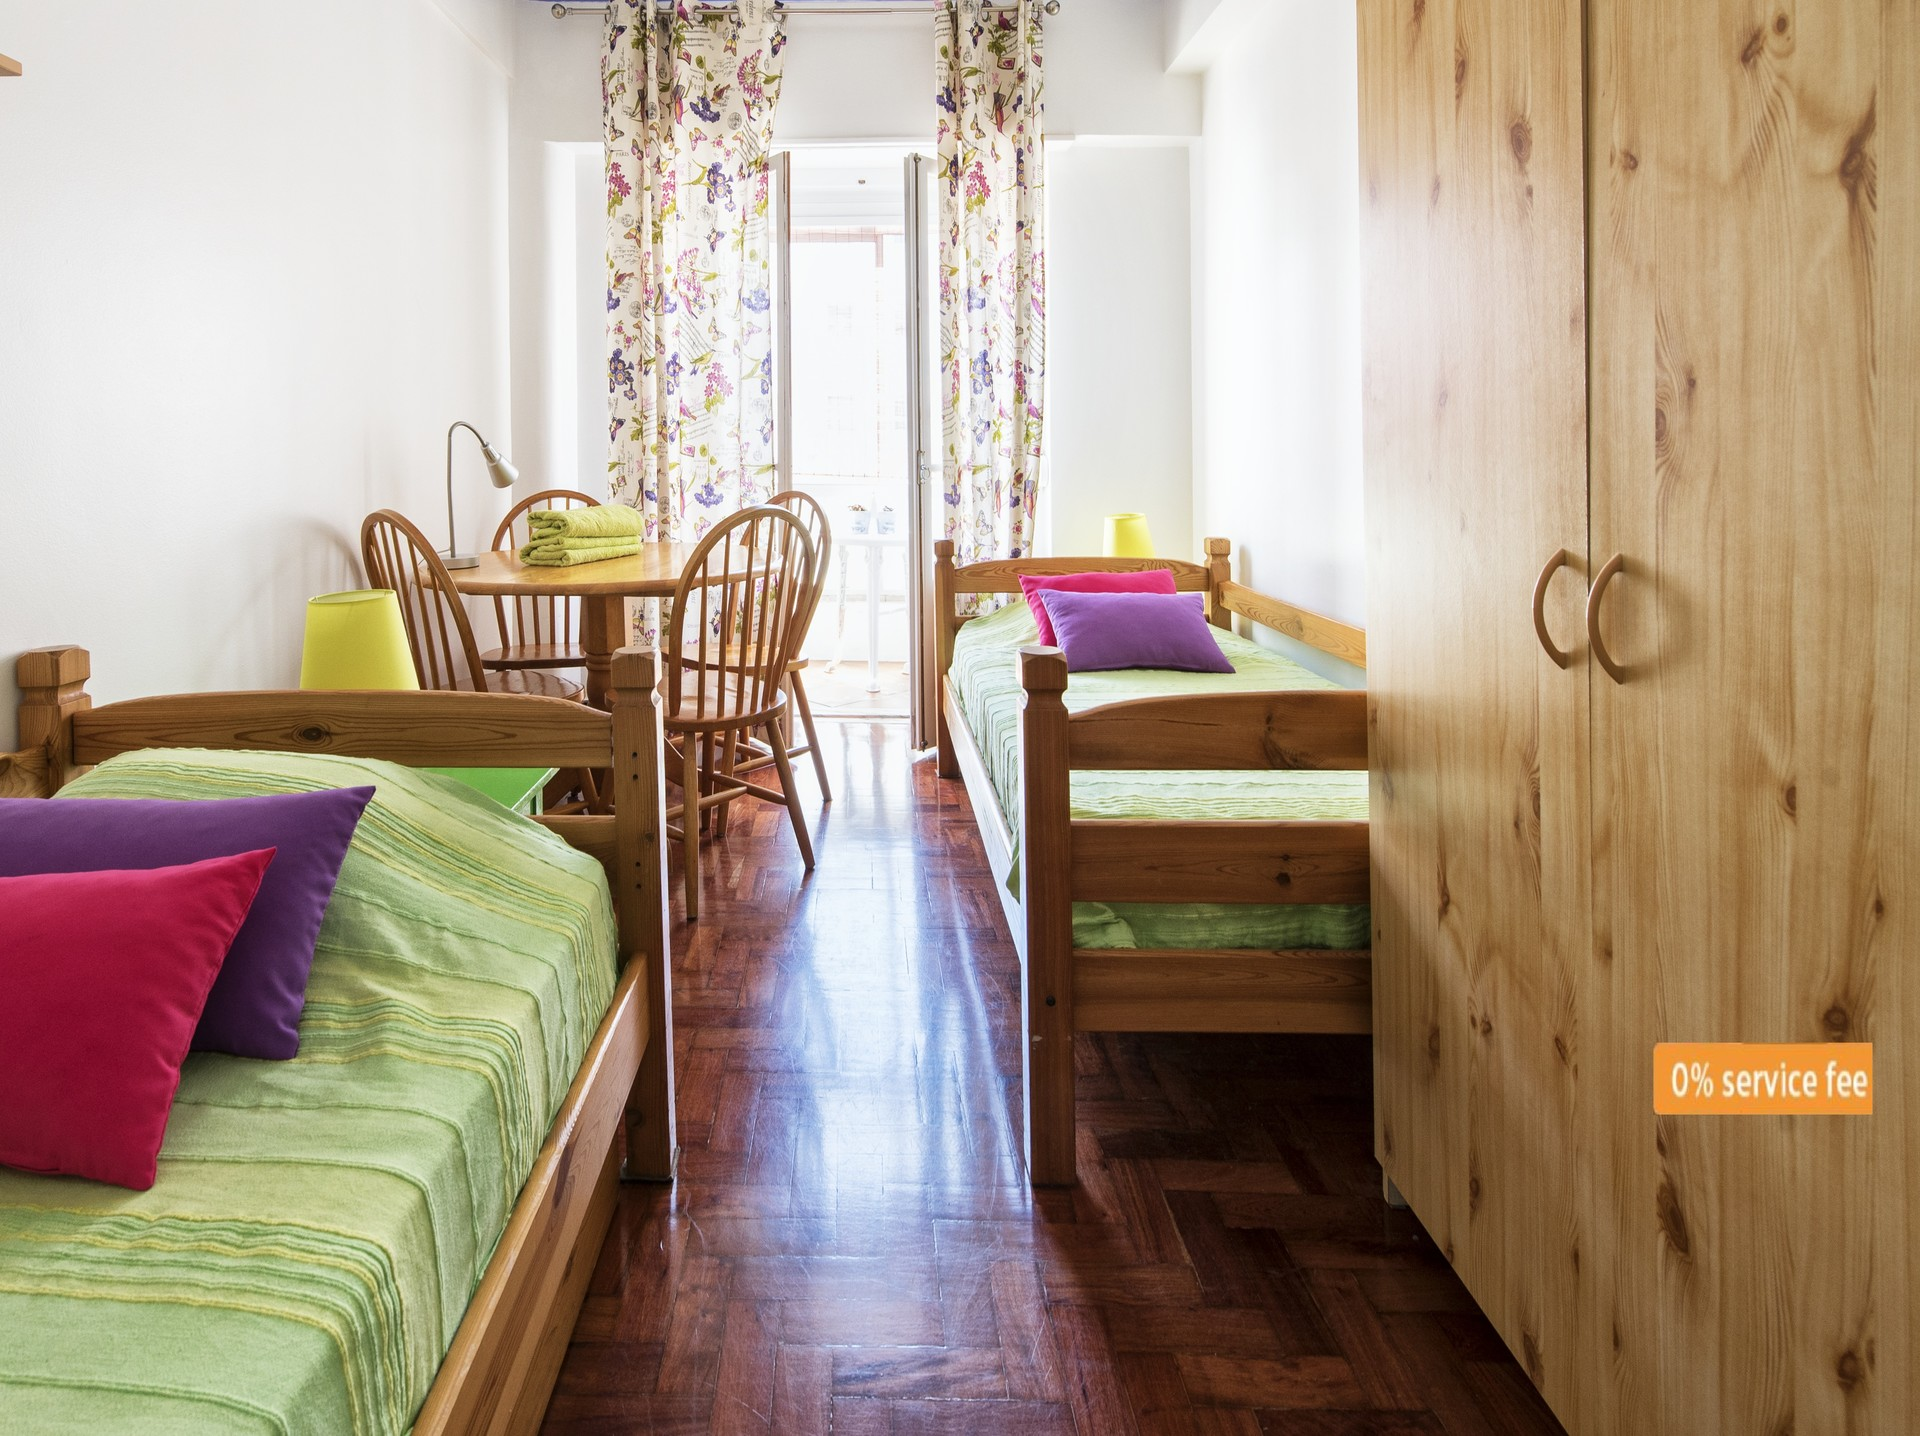 last-double-room-picoas-m-station-yellow-lineextra-bed-guestsucatolicaunova-istlisbons-univ-ef84cd768f9f2f0181bbdcd13cefc0ee